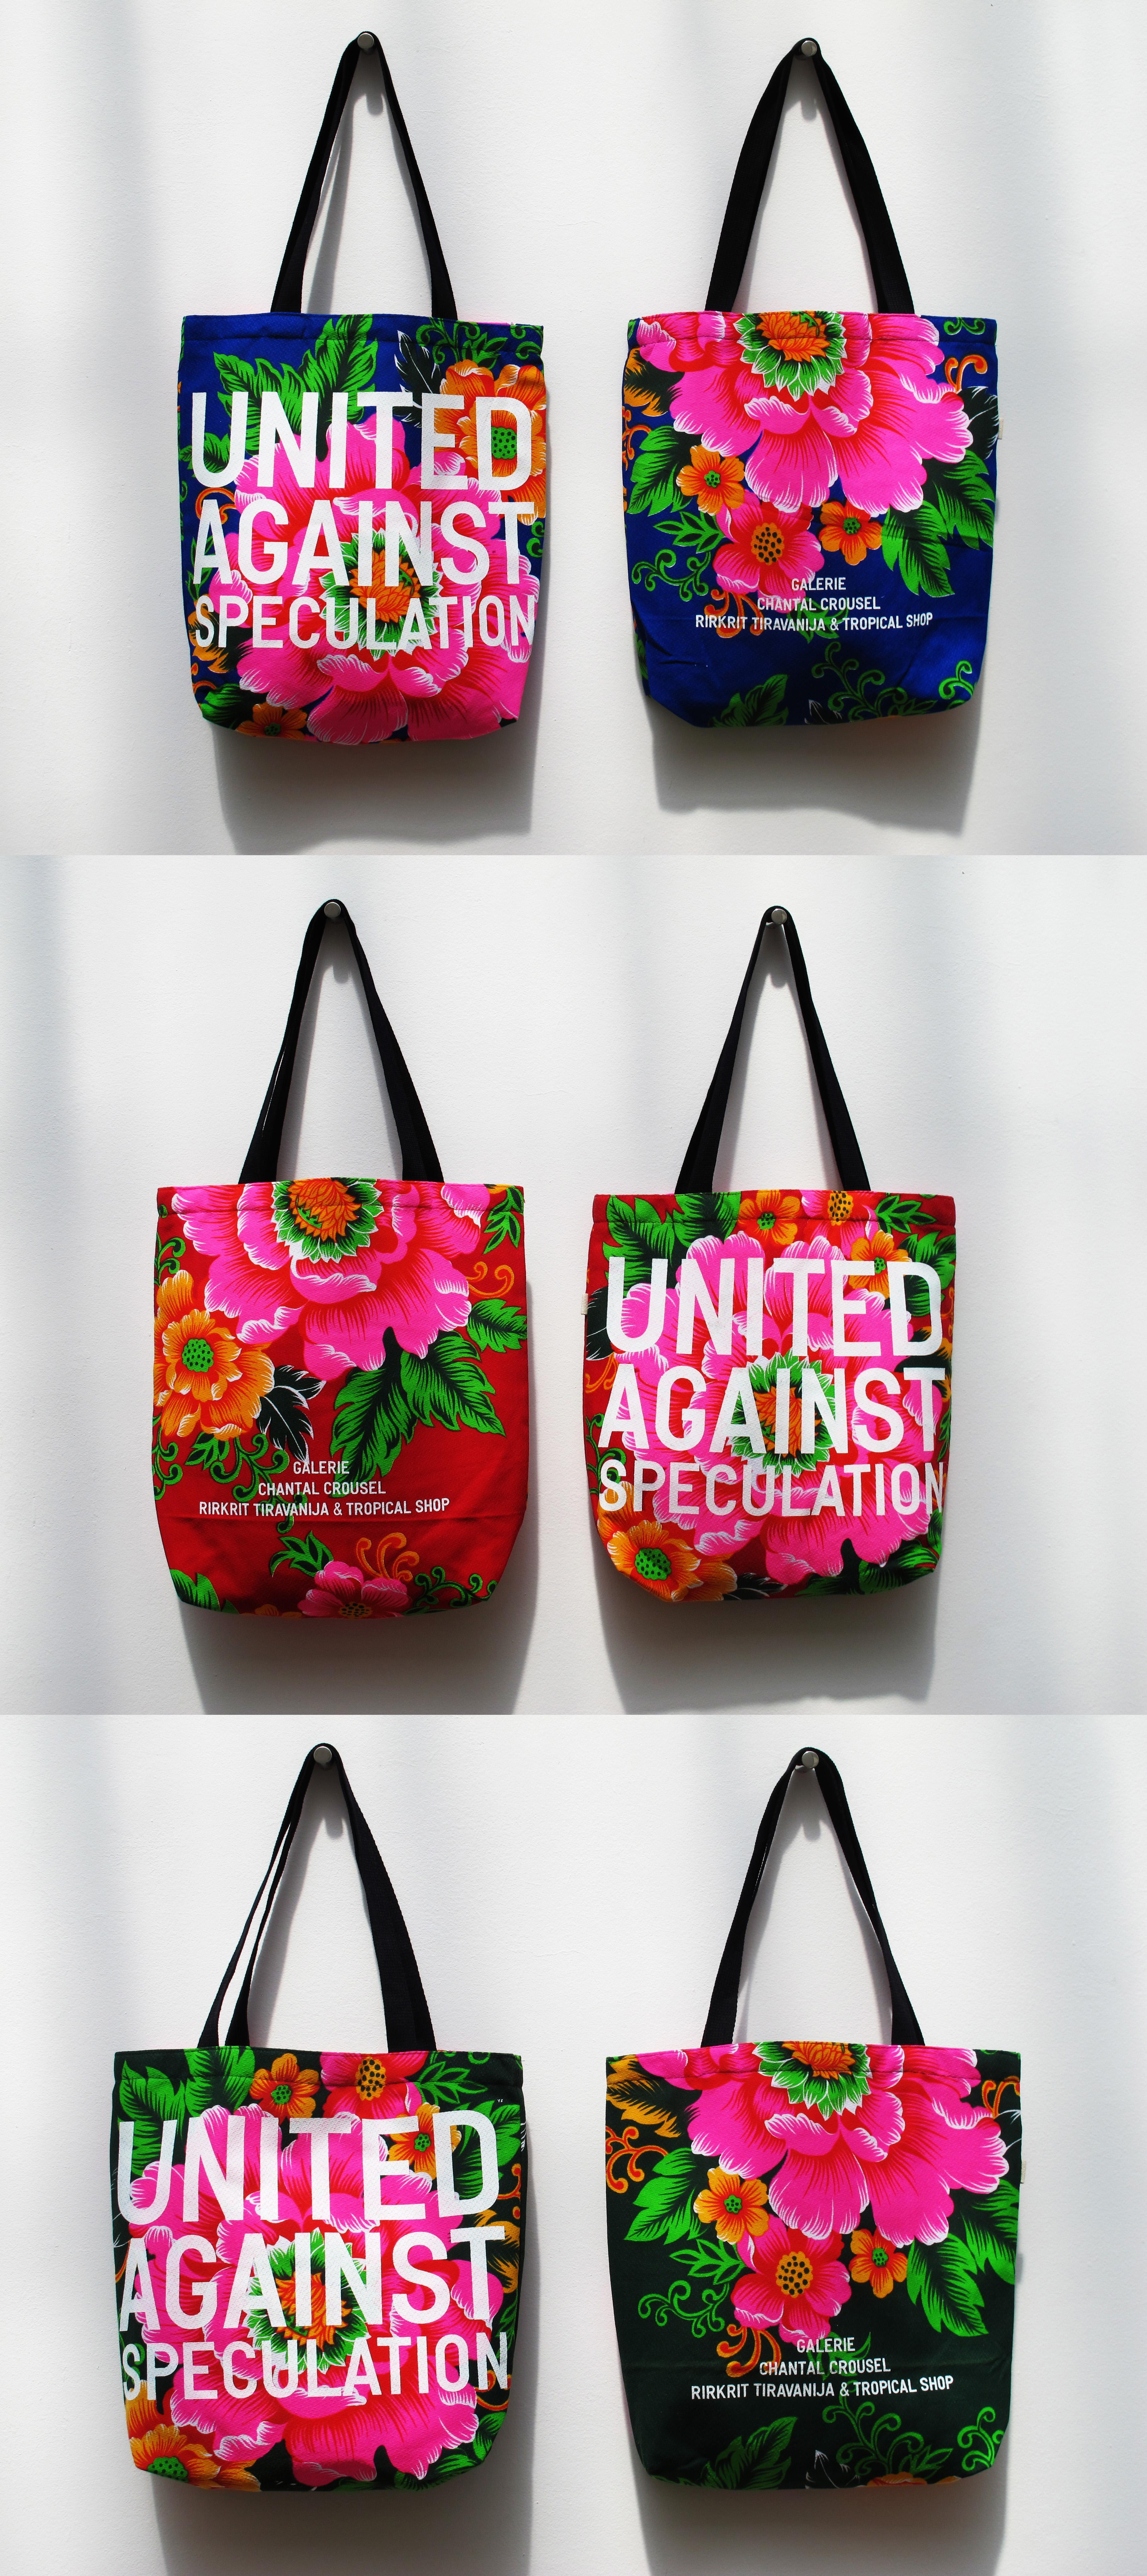 - United Against Speculation -